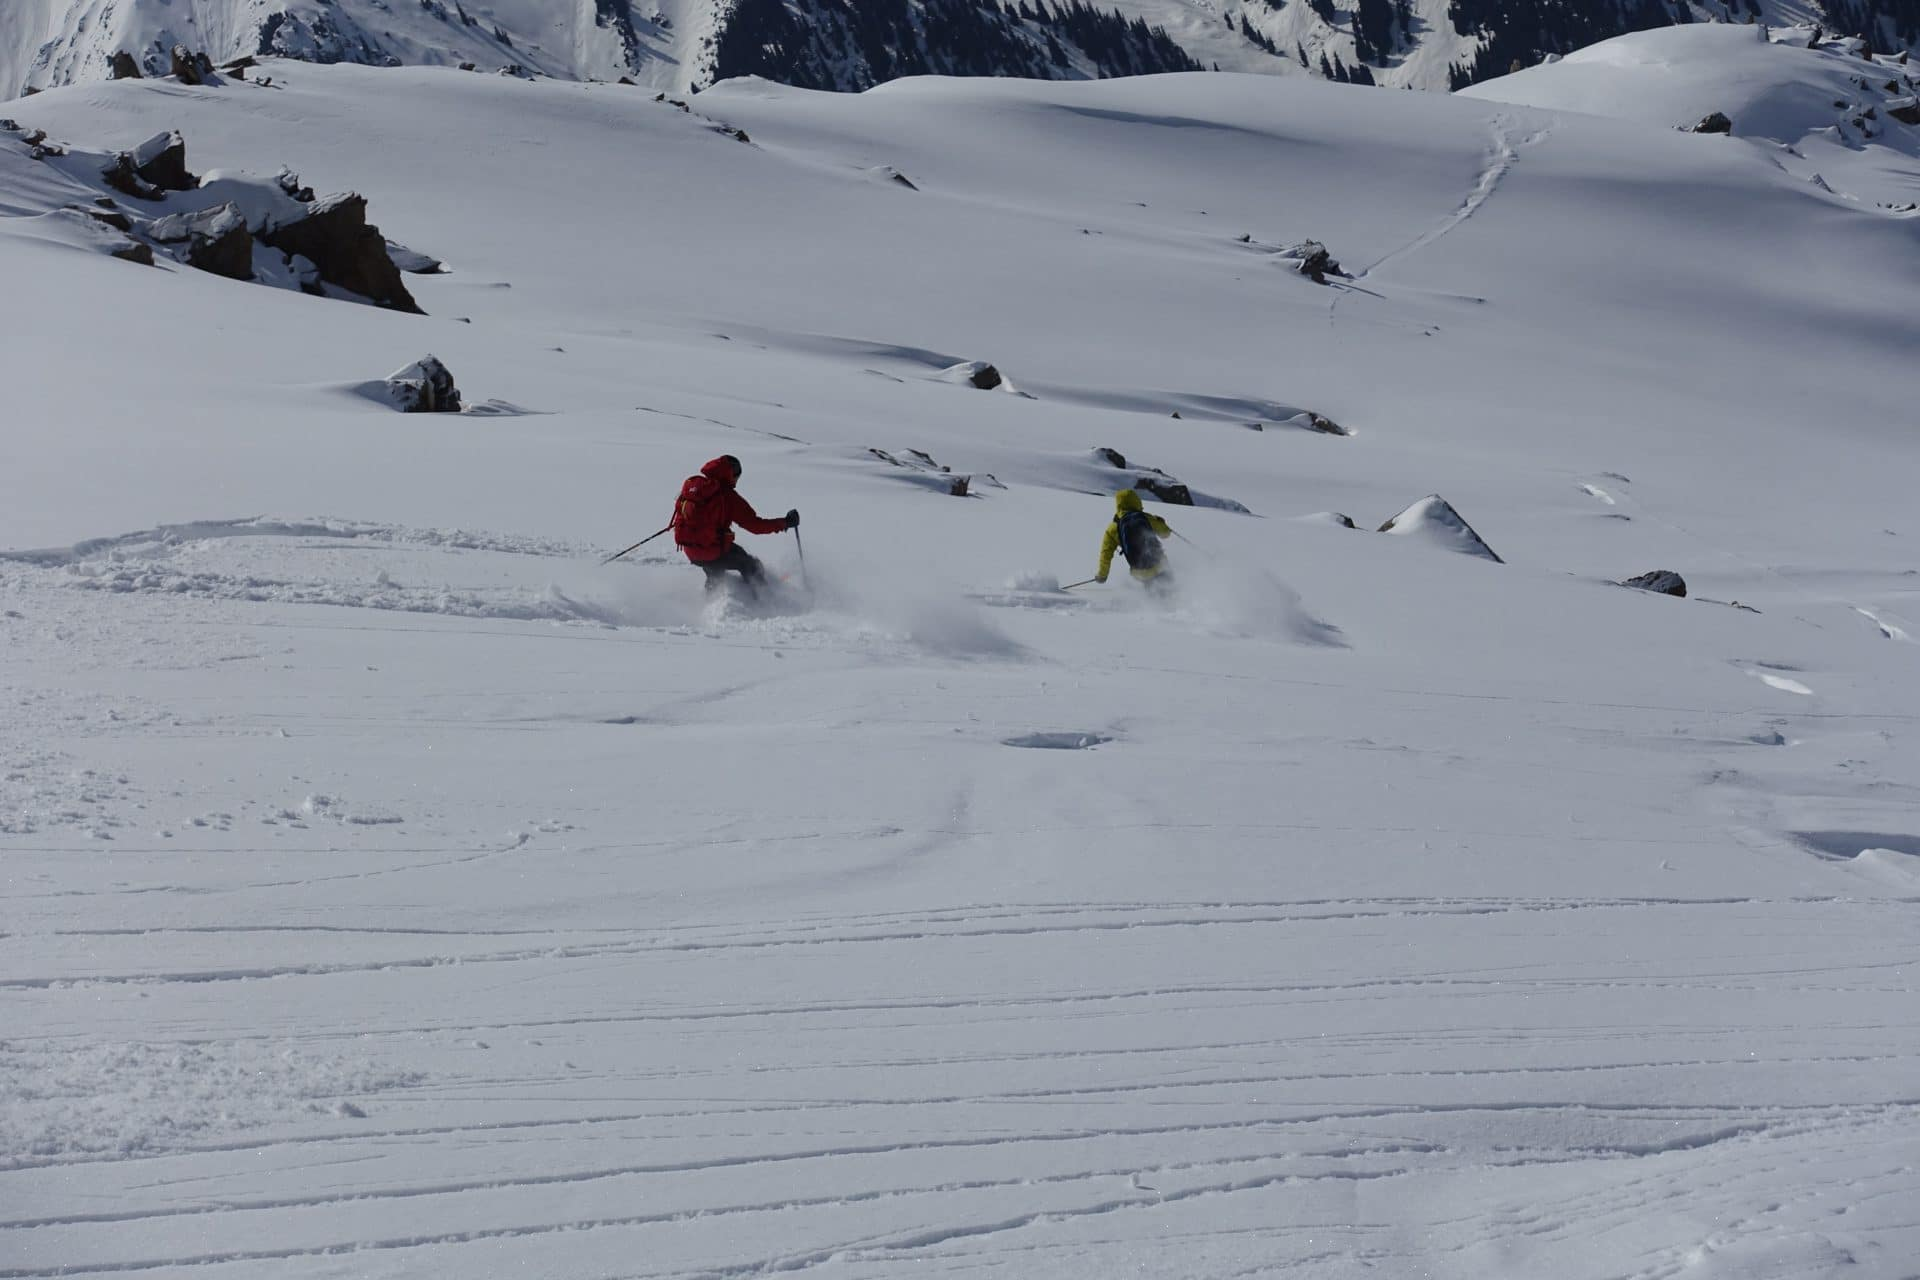 Helyum_Xavier-Carrard_Guide-de-montagne_Ski_Voyage_Kirghistan_Asie-Centrale_Xavier-Marco